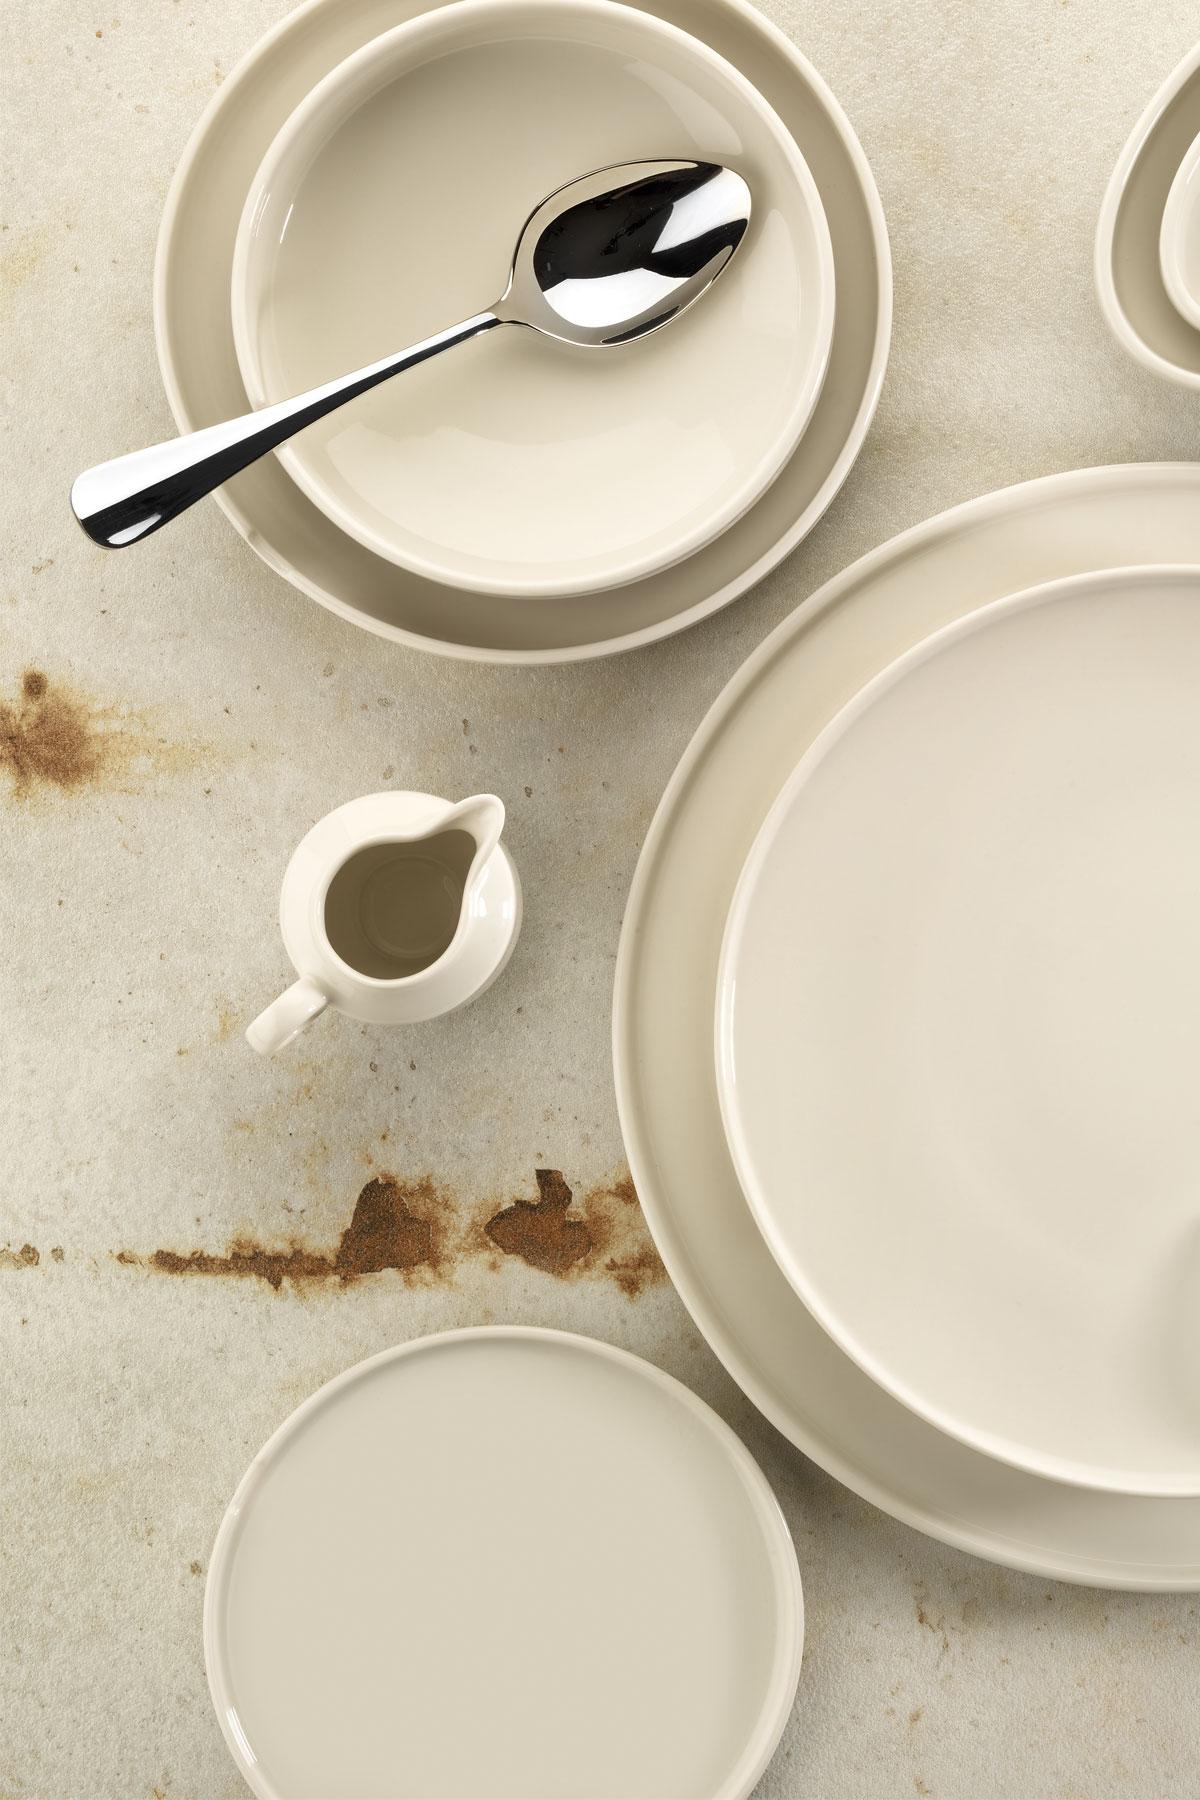 Kütahya Porselen Chef Taste Of Biberlik Krem